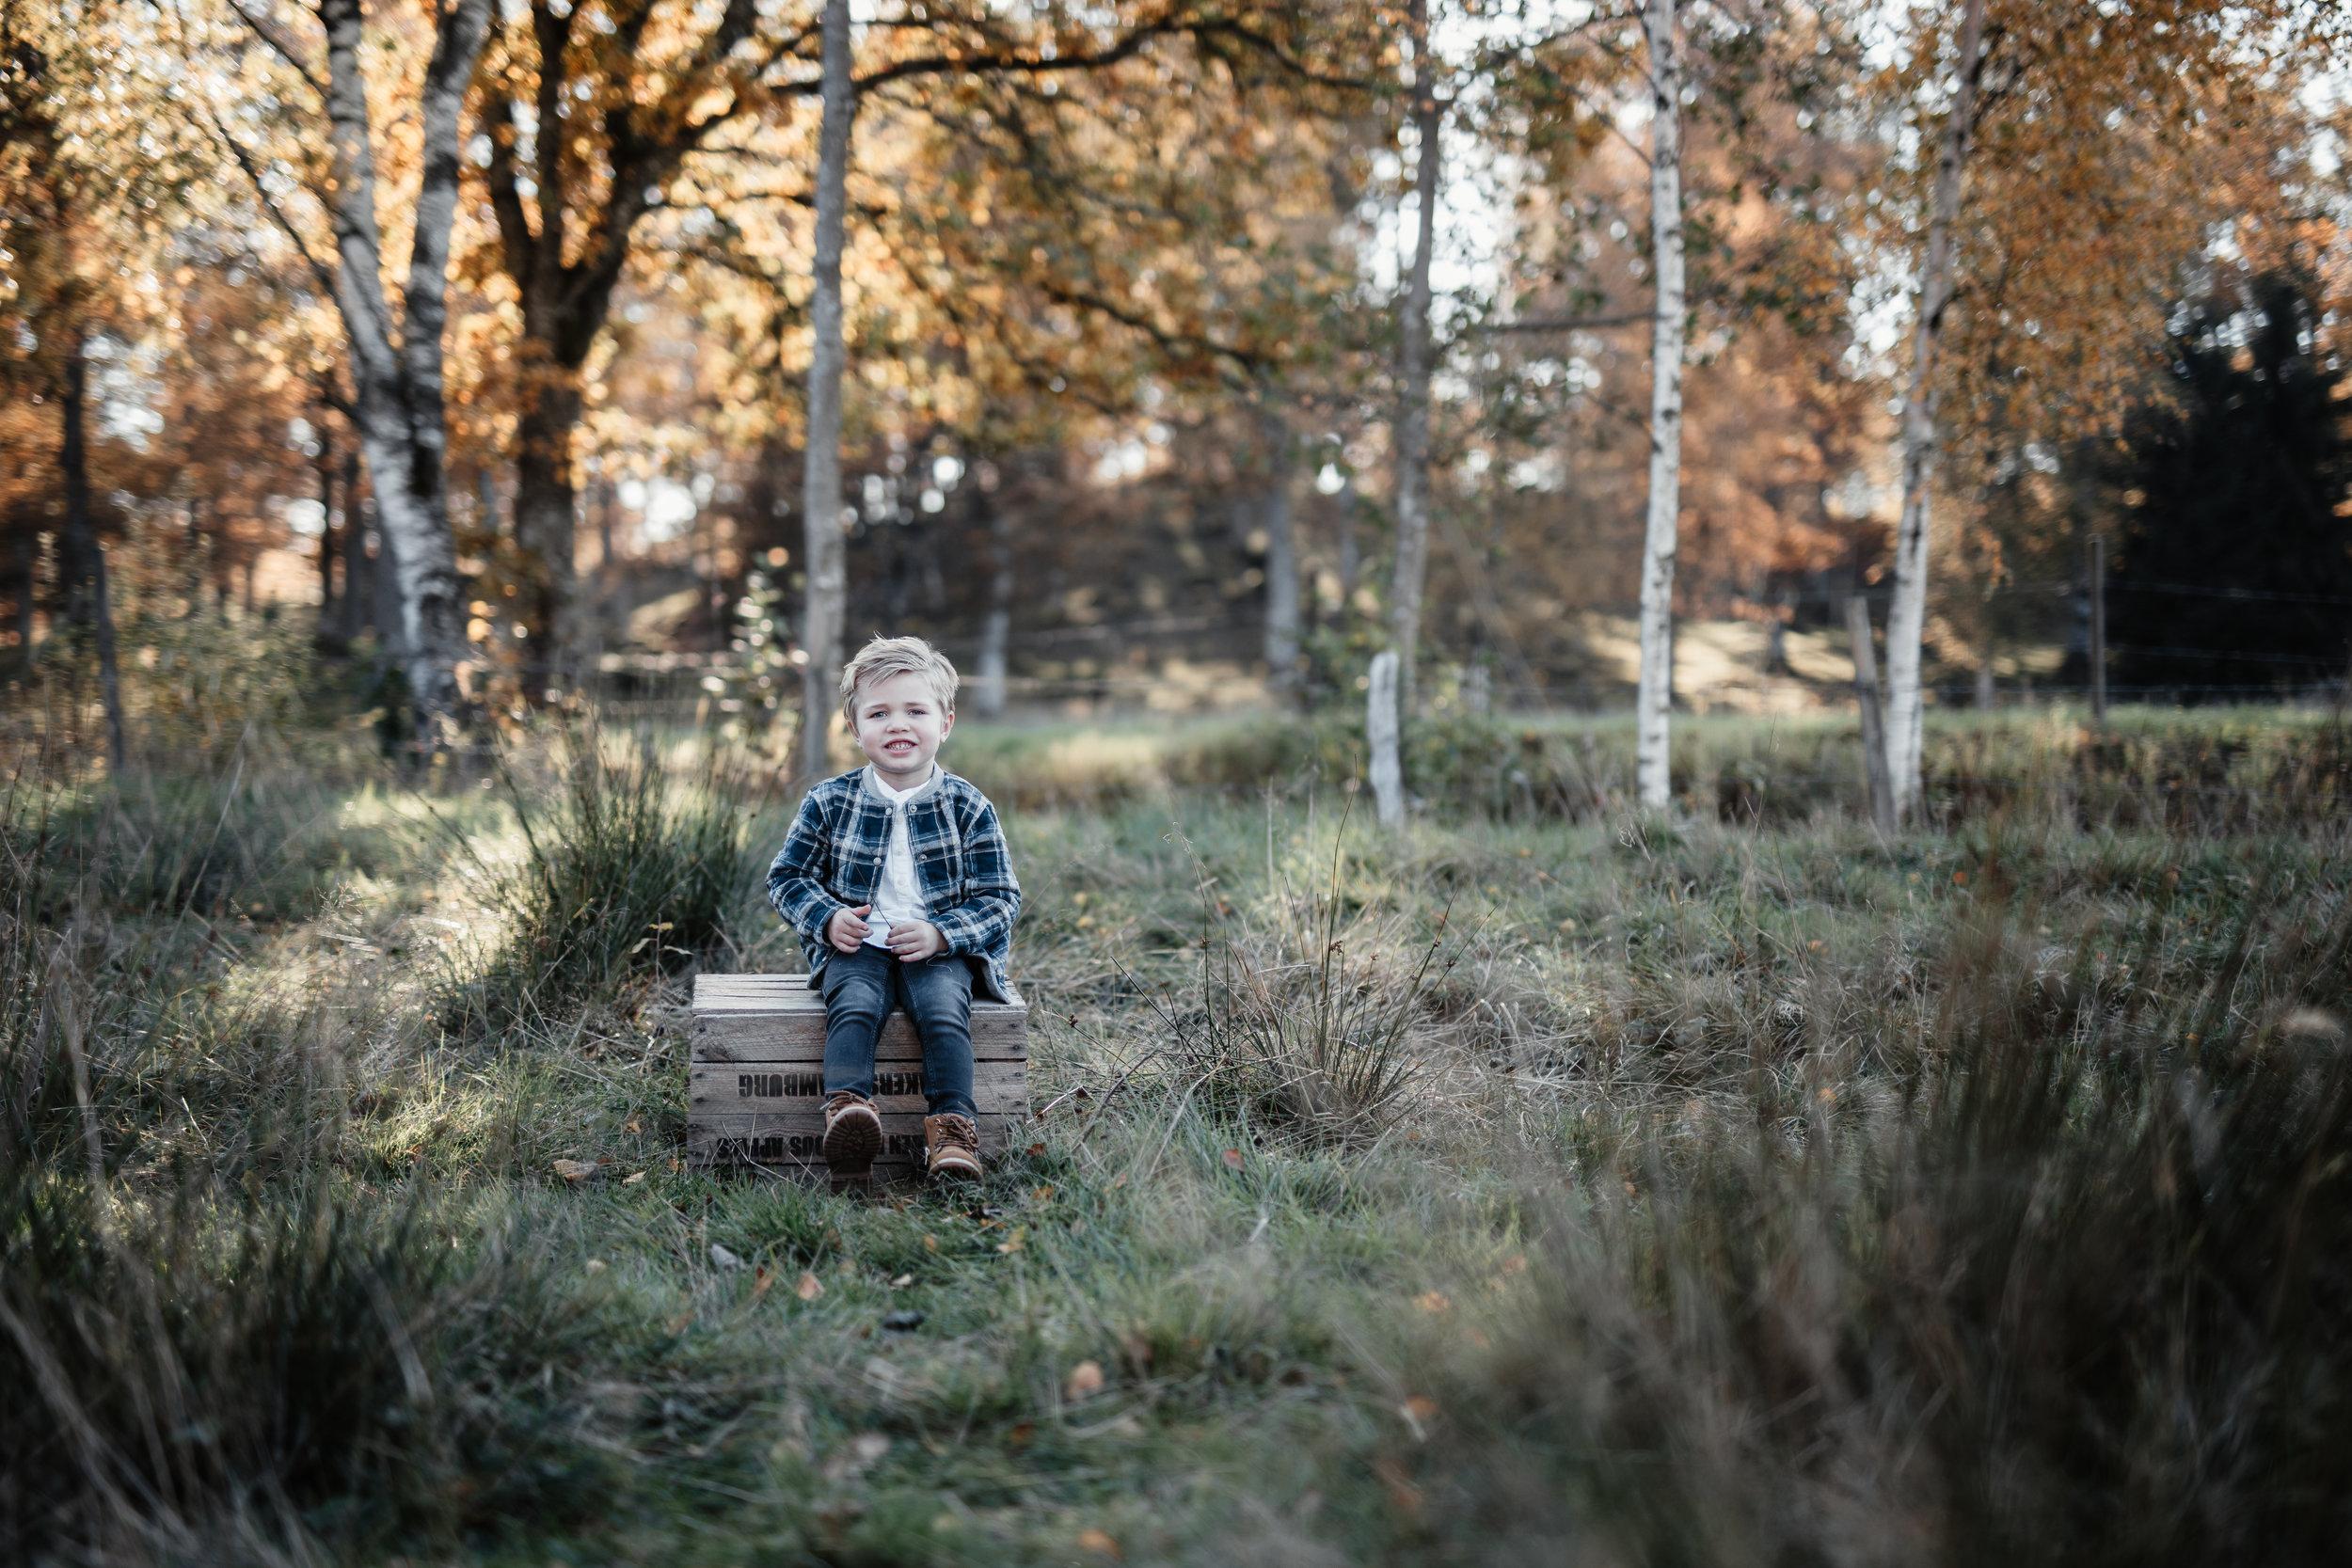 Barnfotograf-Fotograf Emilia-Familjefotograf-2.jpg